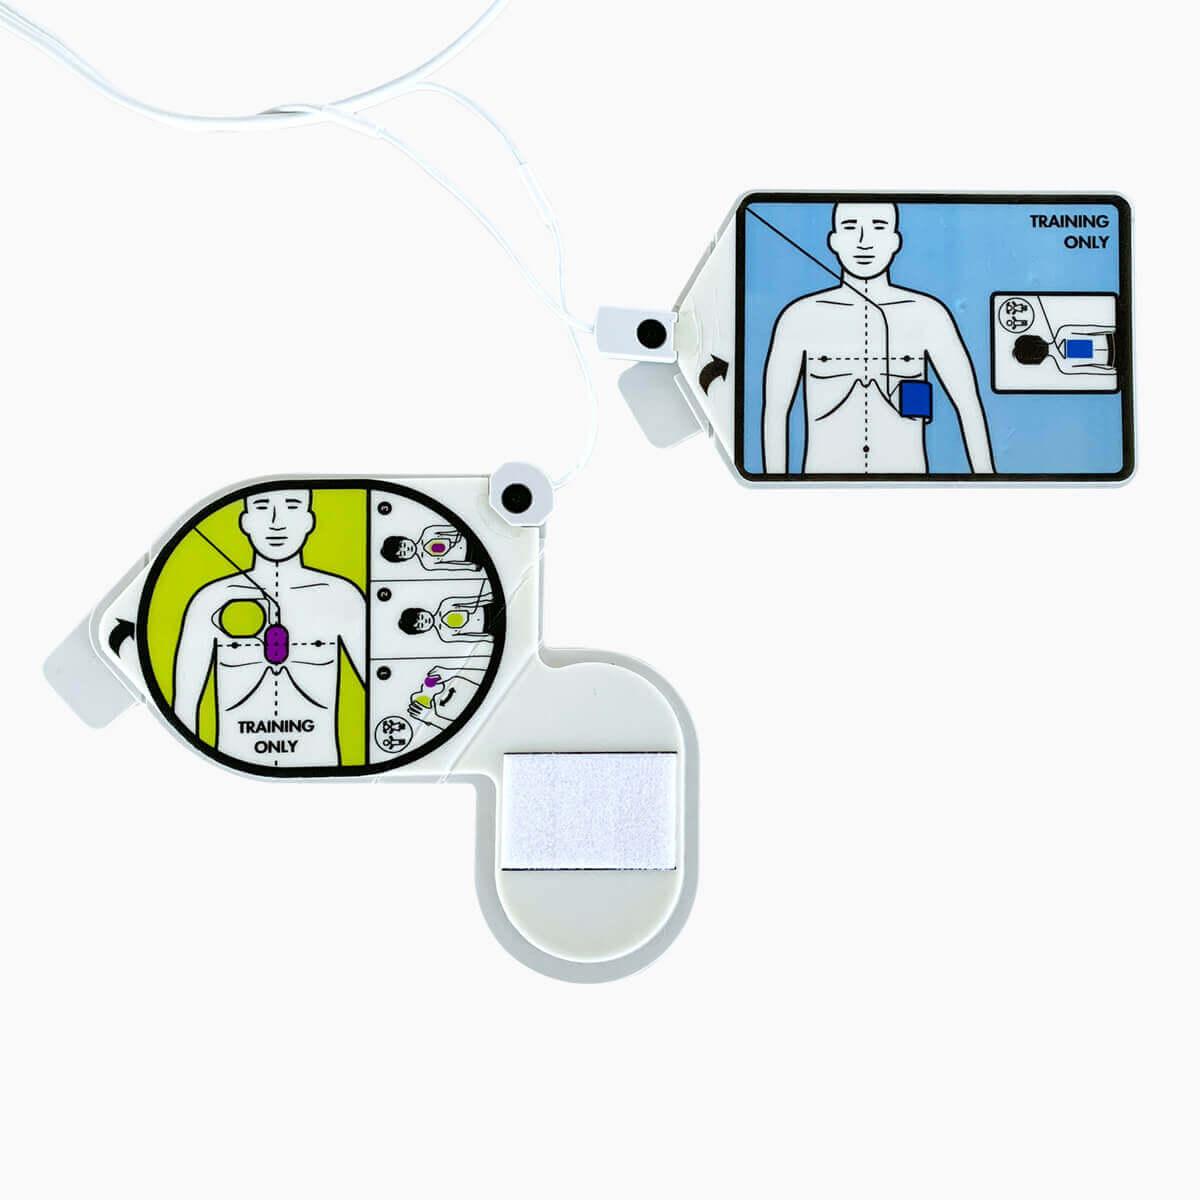 Ersatz-Trainingselektrode ZOLL CPR Uni-padz II für den ZOLL AED 3 Trainer